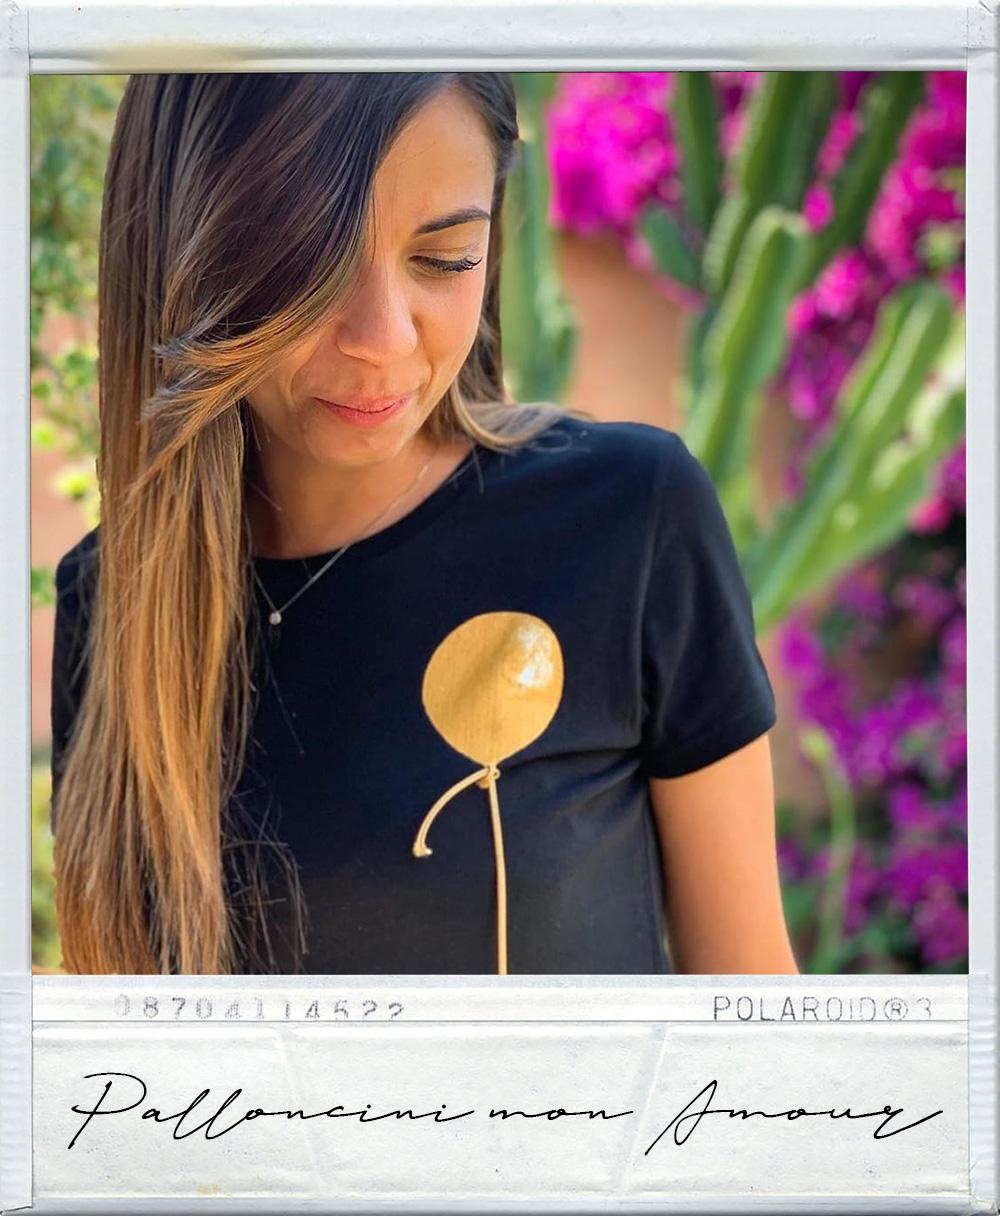 Palloncini mon Amour